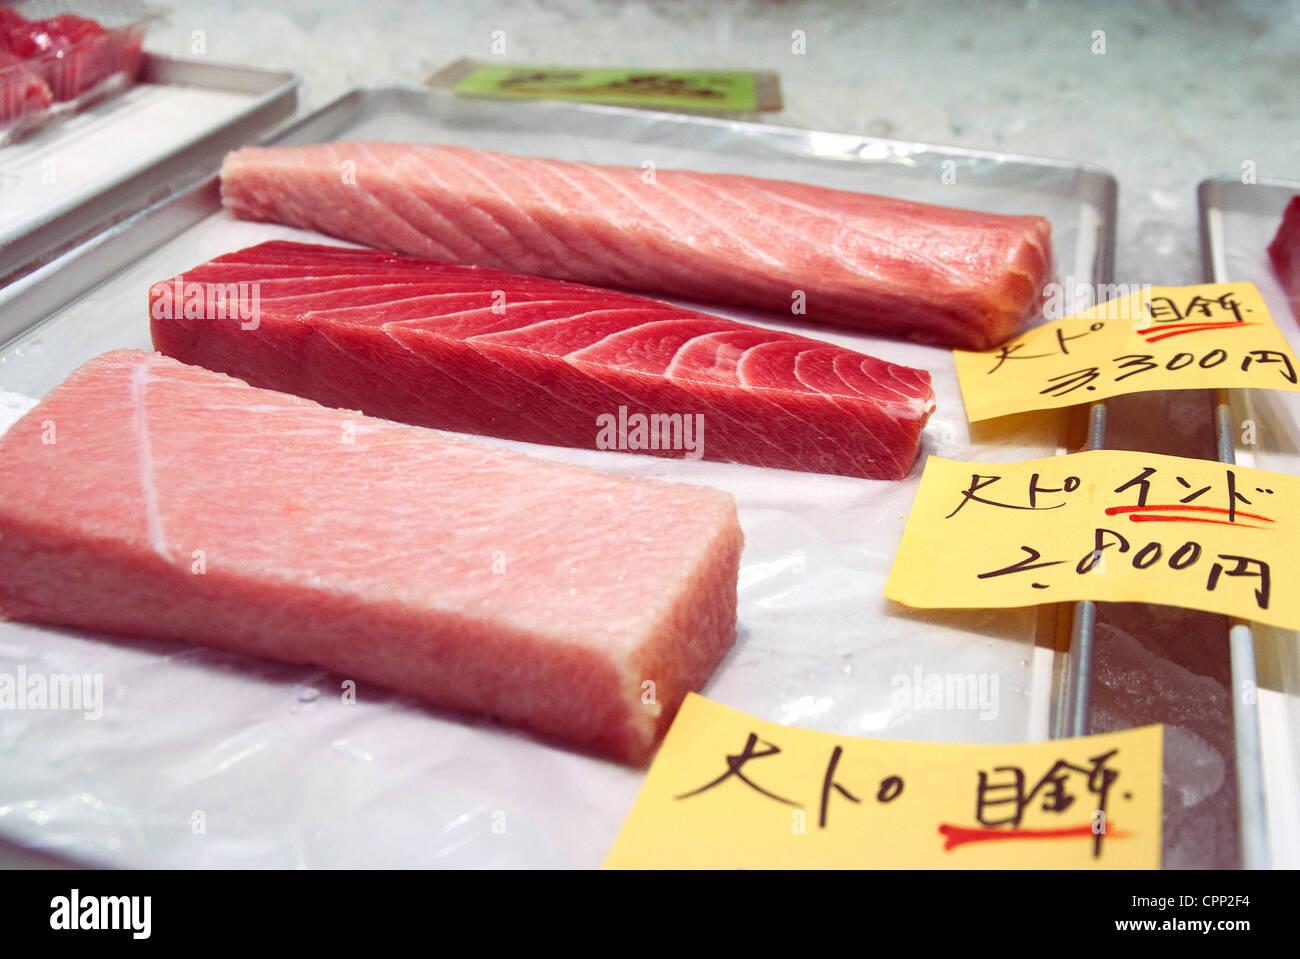 FOOD MARKET - Stock Image